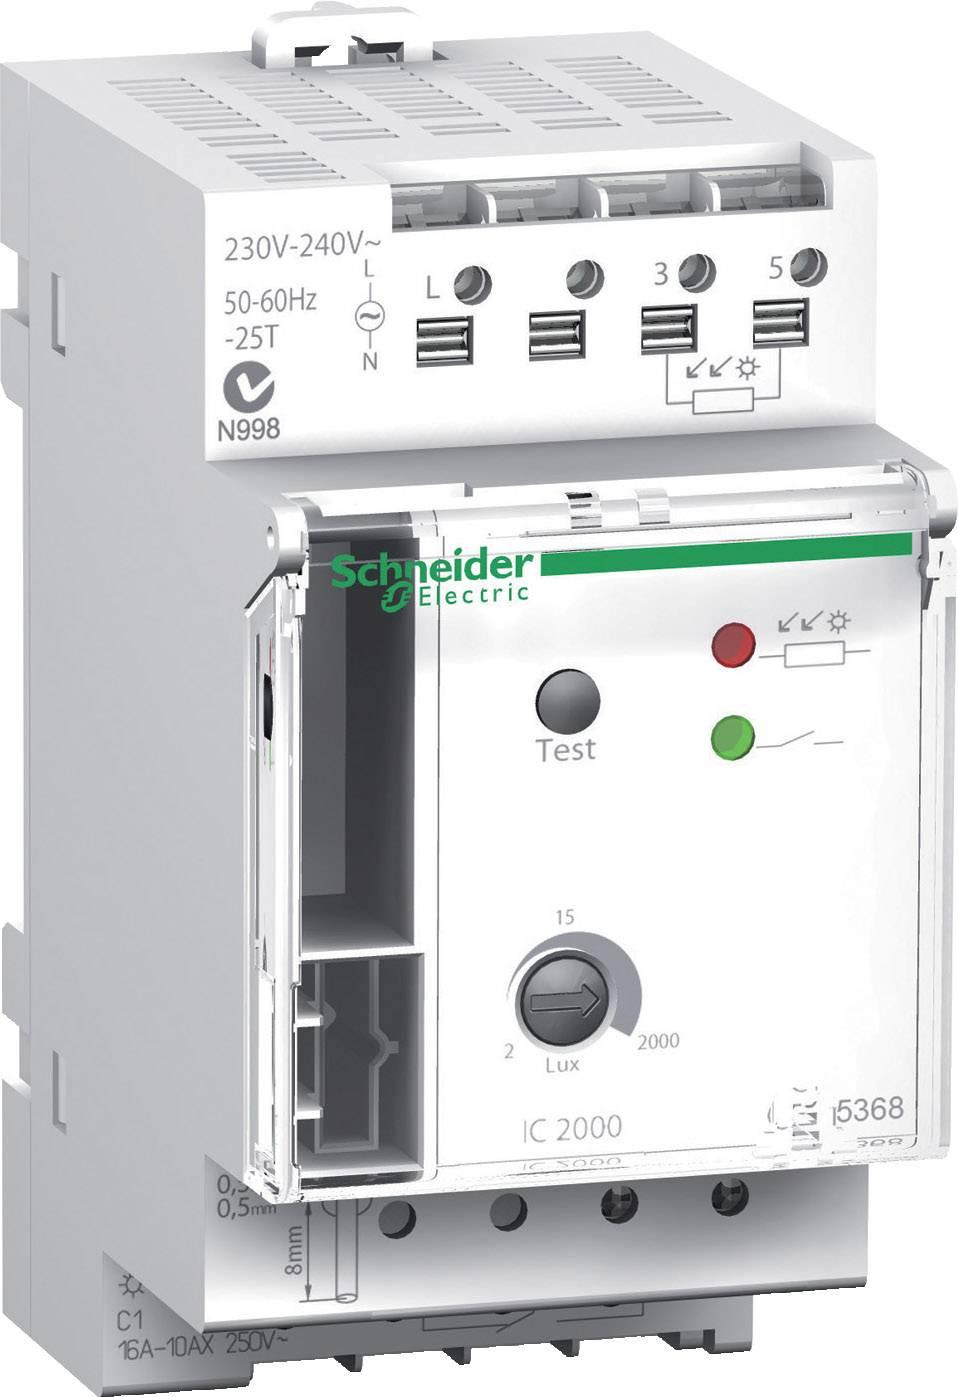 Řezačka CCT15368 Ic 2000 2-2000Lux Schneider Electric CCT15368